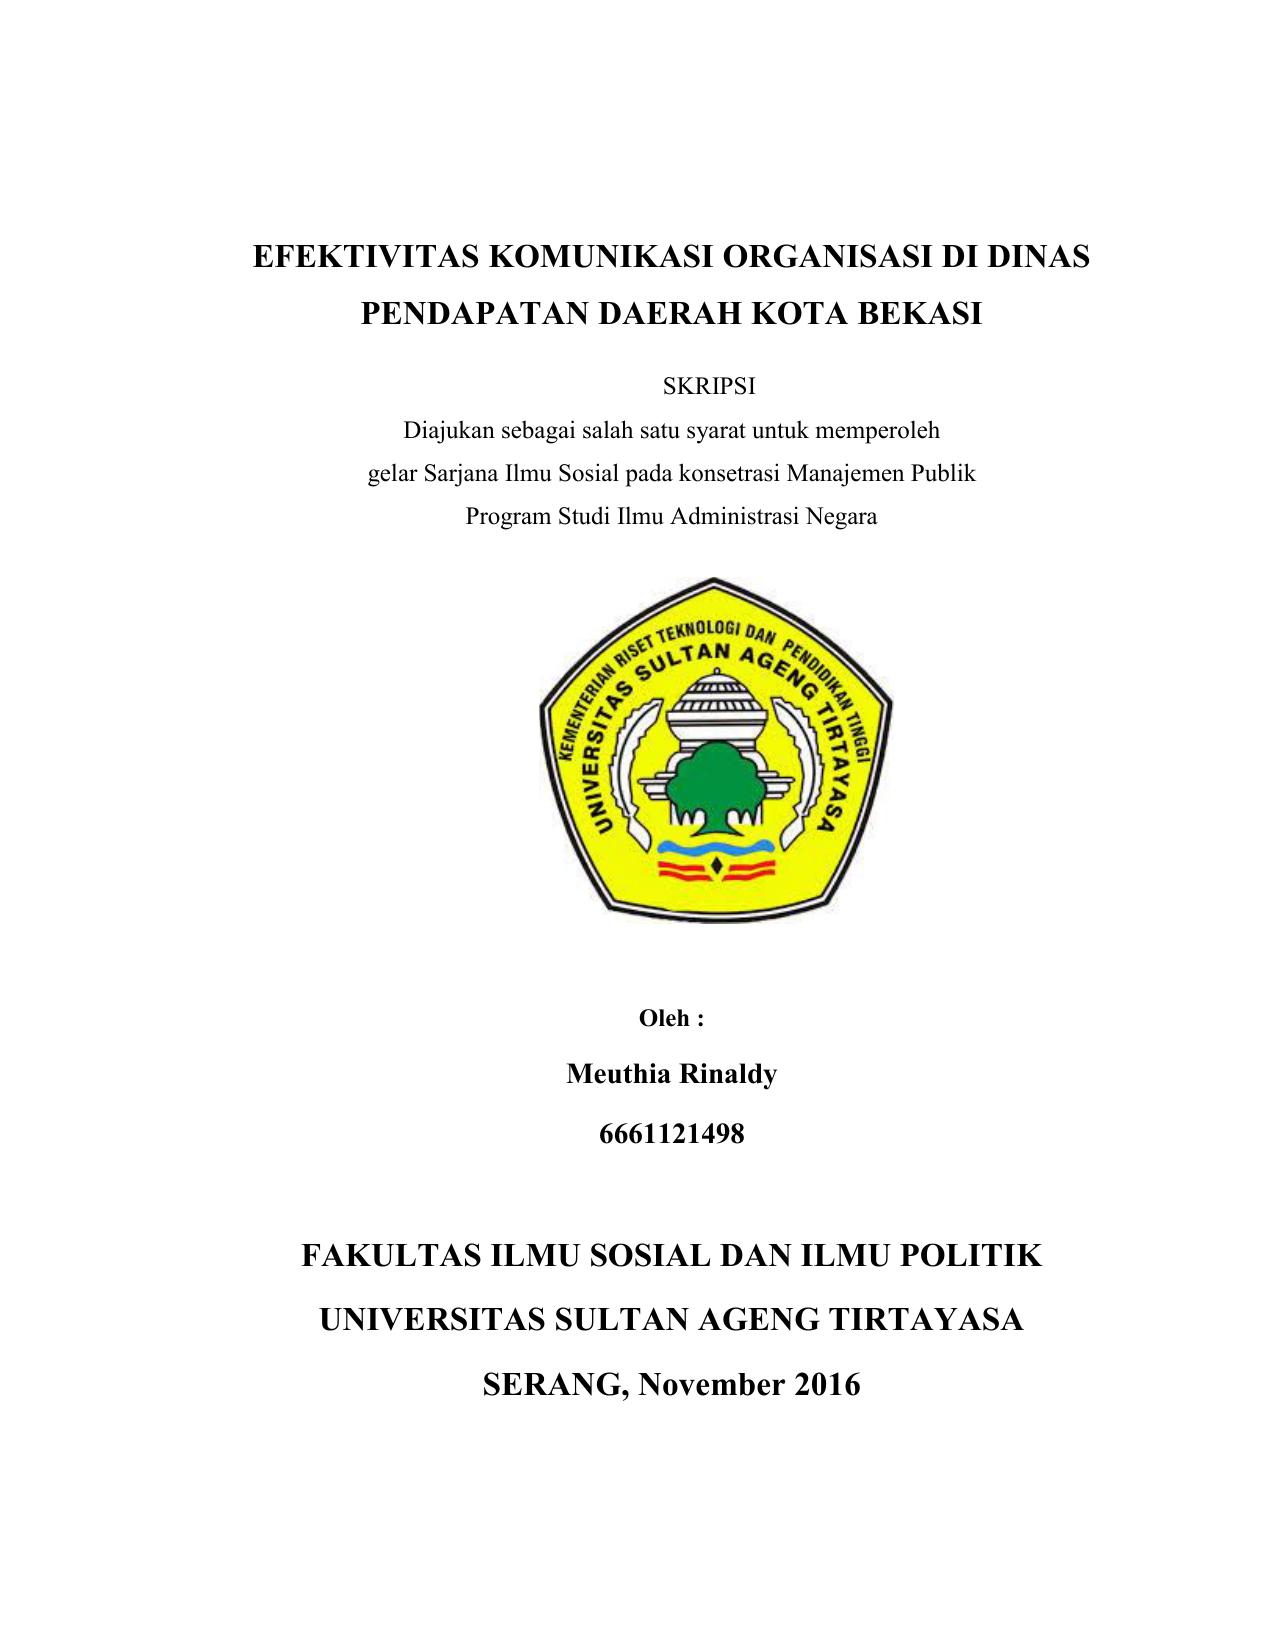 Efektivitas Komunikasi Organisasi Di Dinas Pendapatan Daerah Kota